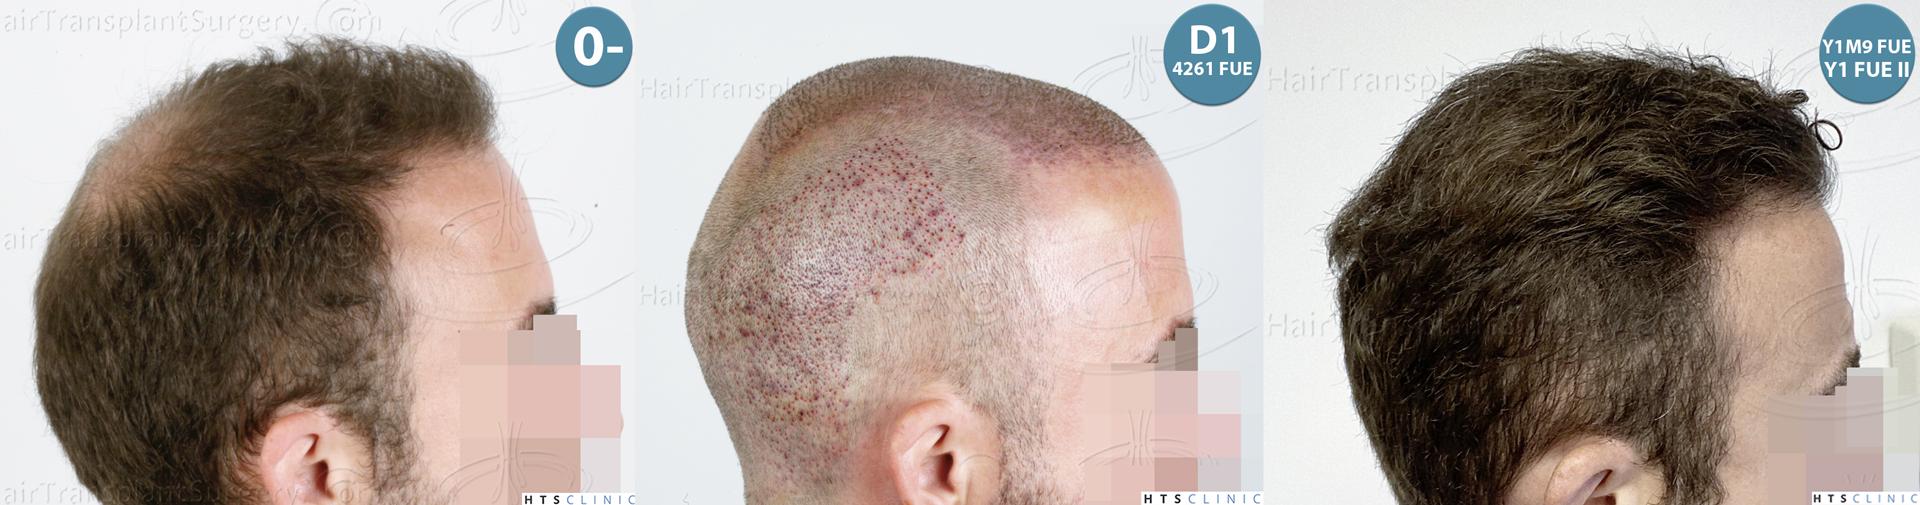 Dr.Devroye-HTS-Clinic-6326-FUE-_4261_2065_-Montage-4.jpg